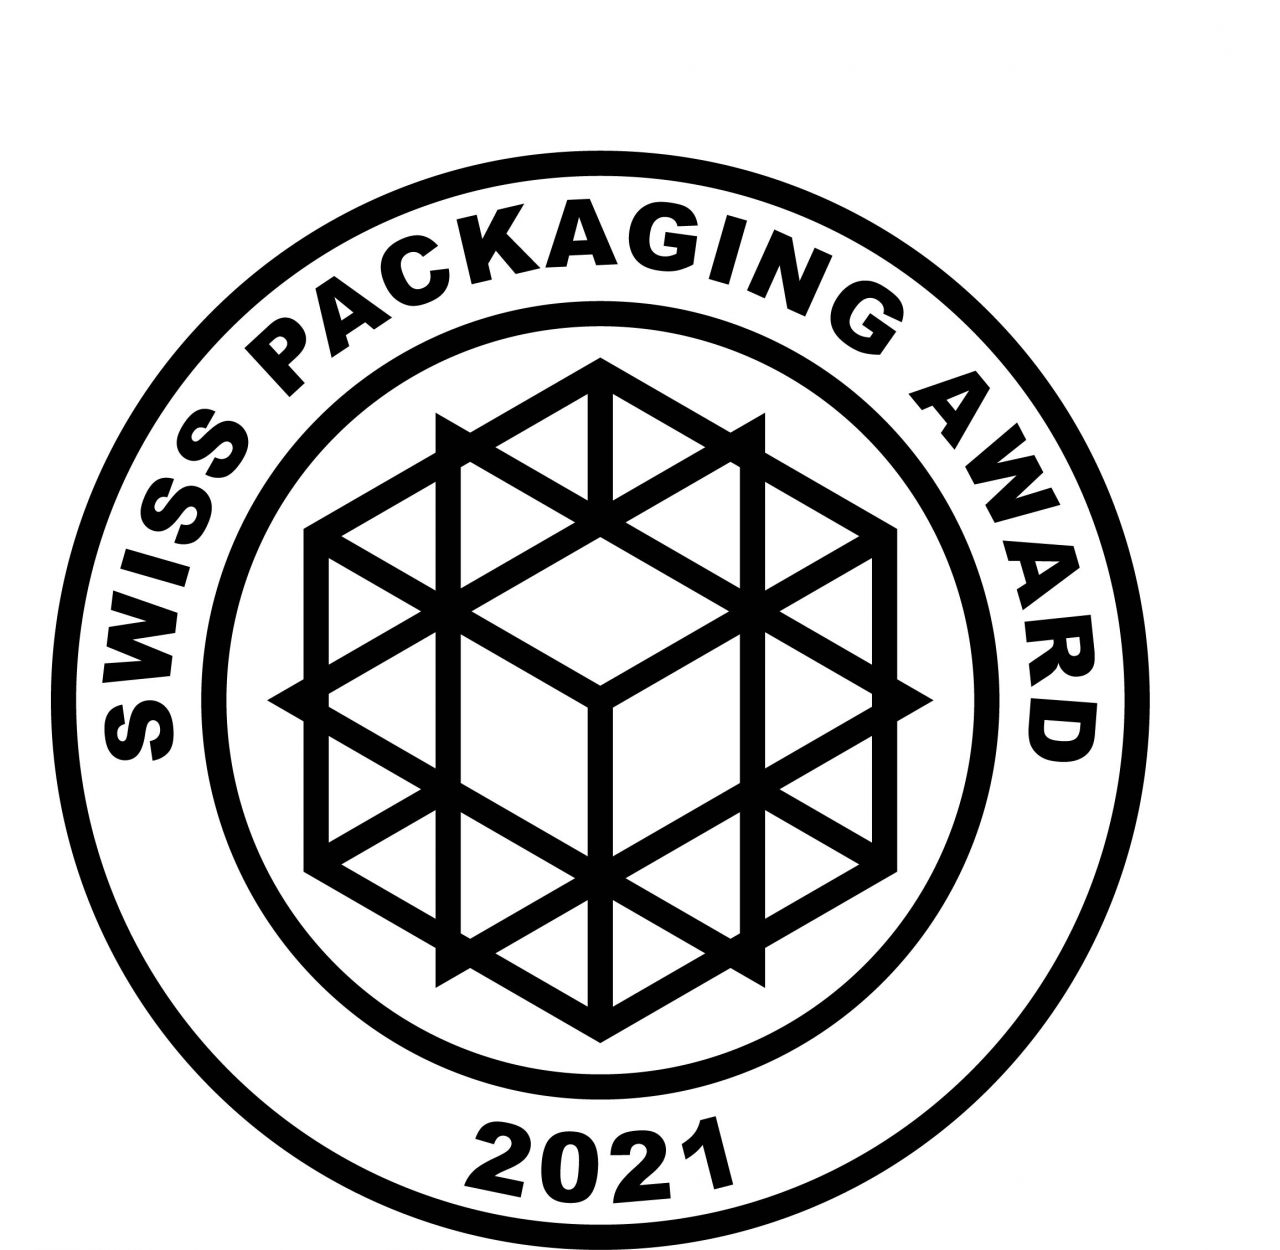 LogoSwissPackagingAward-2021-1280x1250.jpg